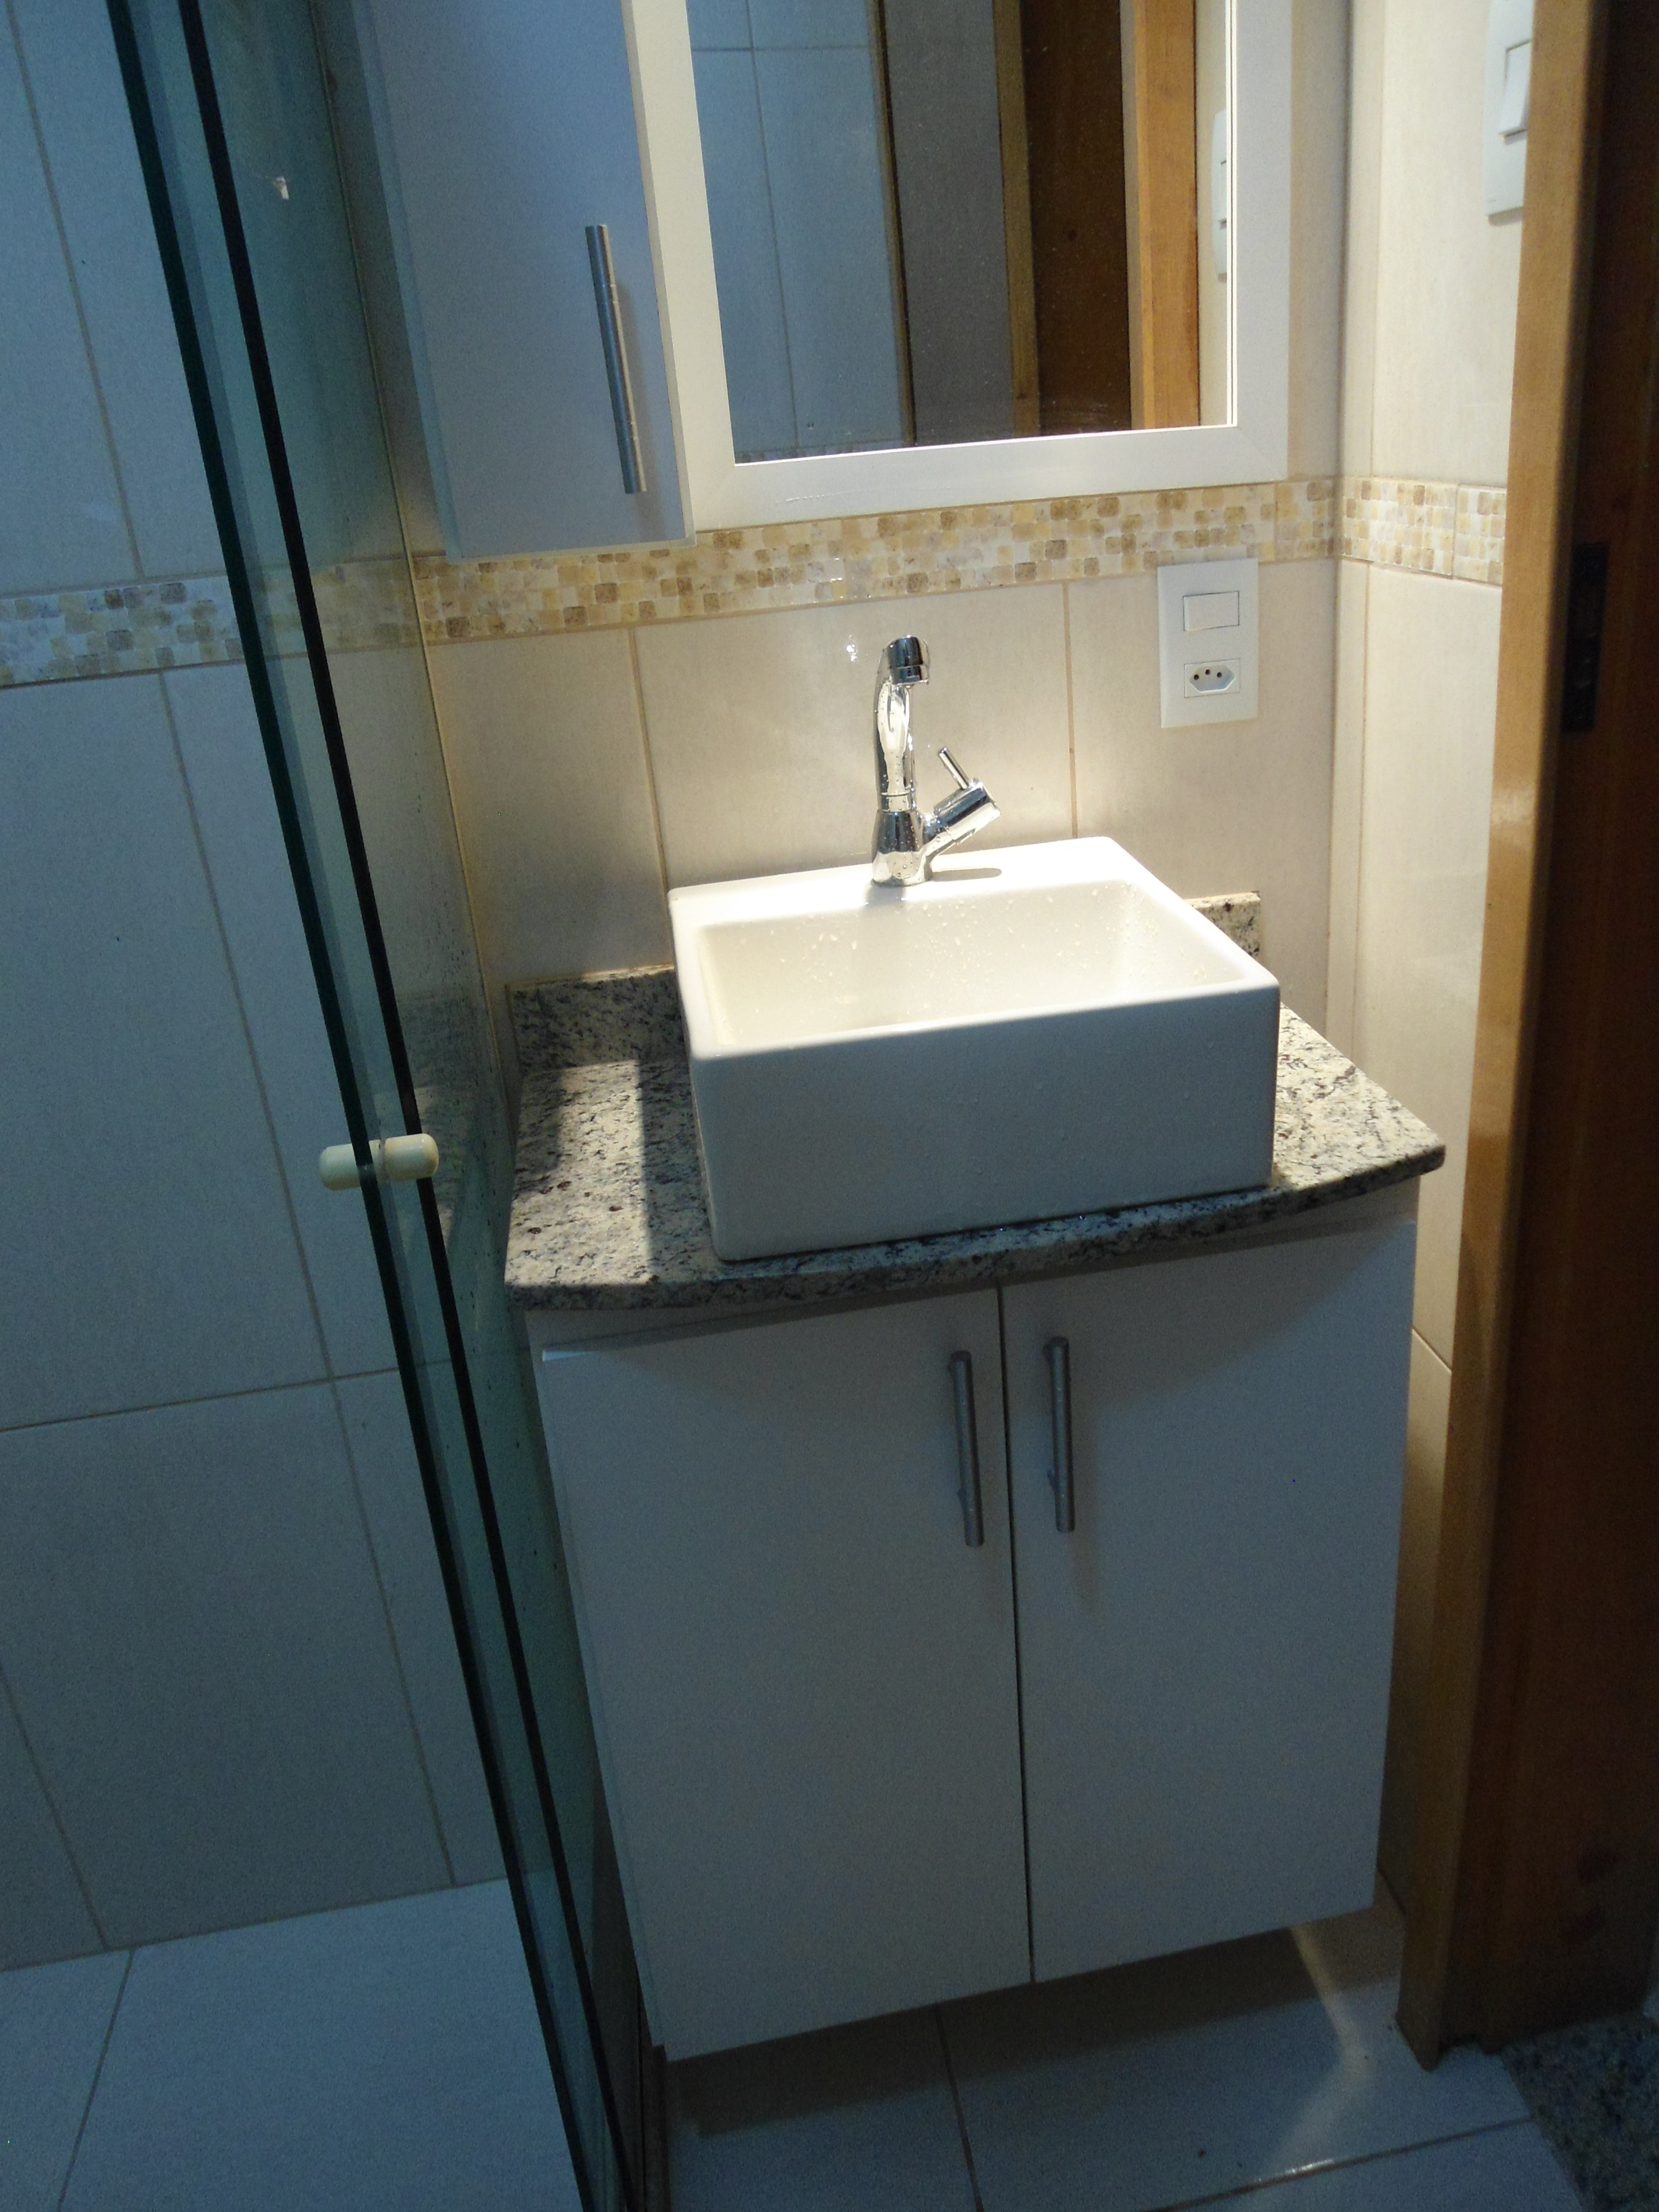 armario de banheiro armario de banheiro armario de banheiro #614828 3000x4000 Armario Banheiro Sao Joao